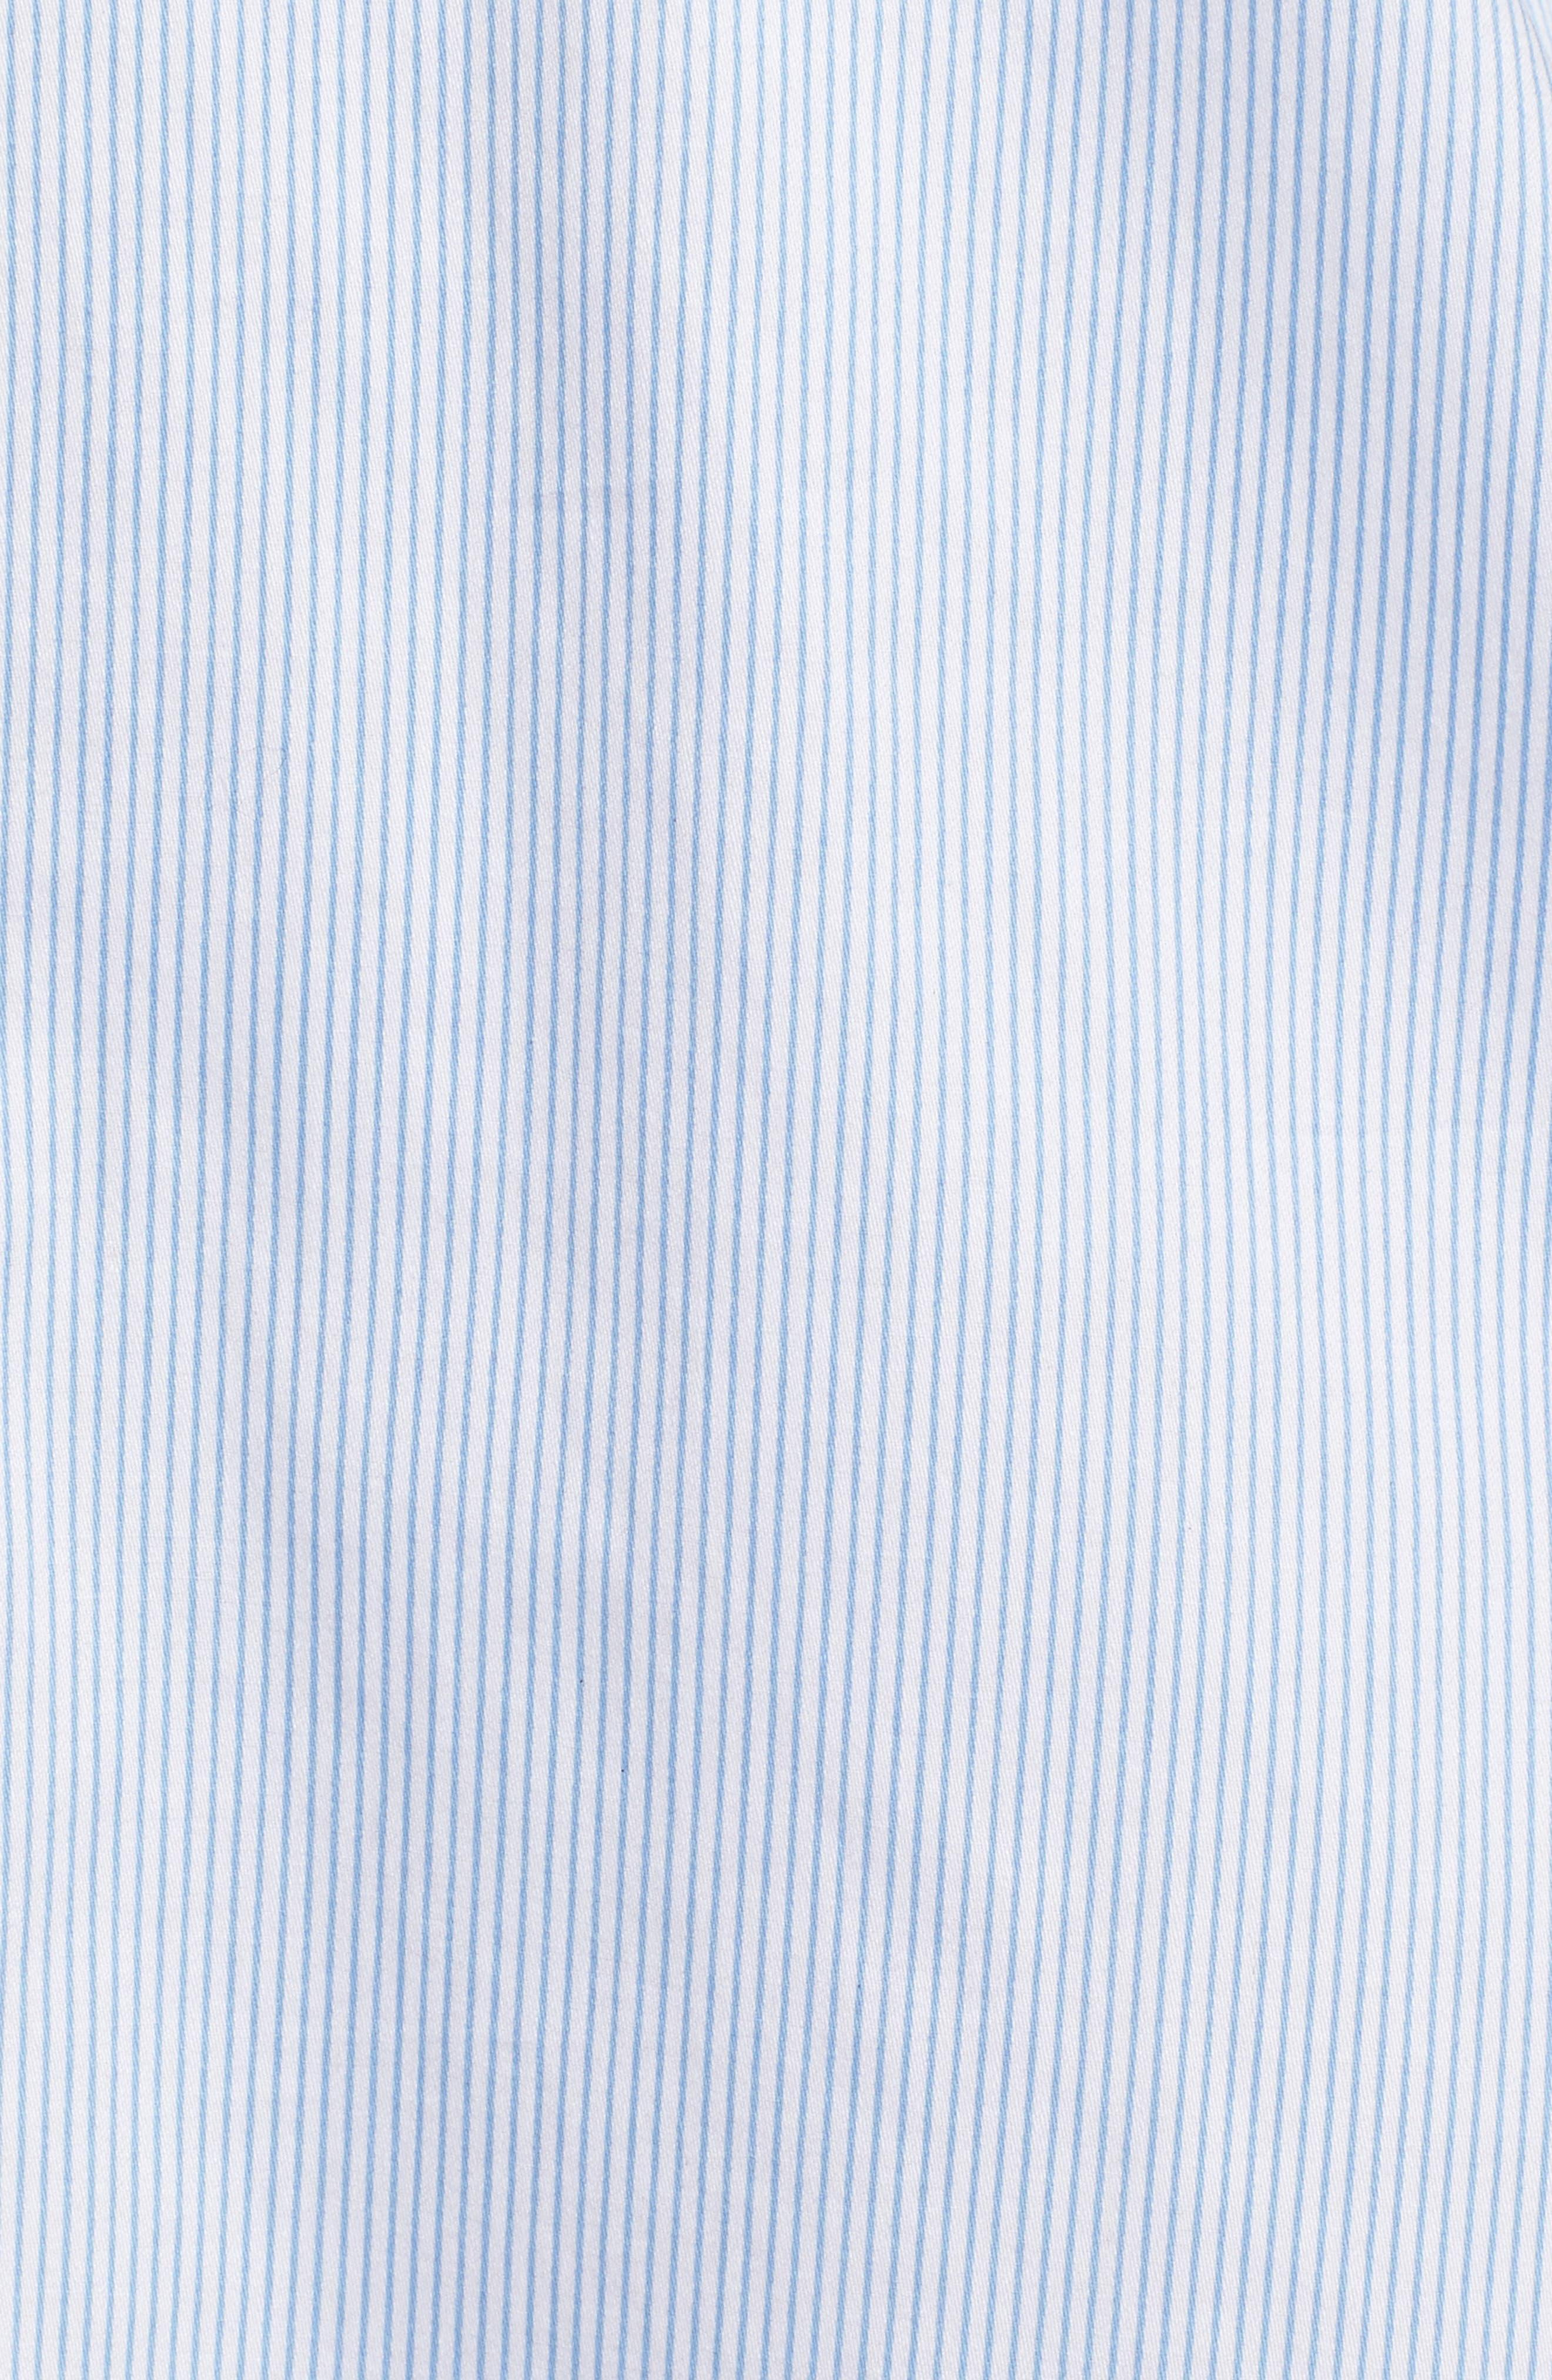 Sleep Shirt,                             Alternate thumbnail 5, color,                             464